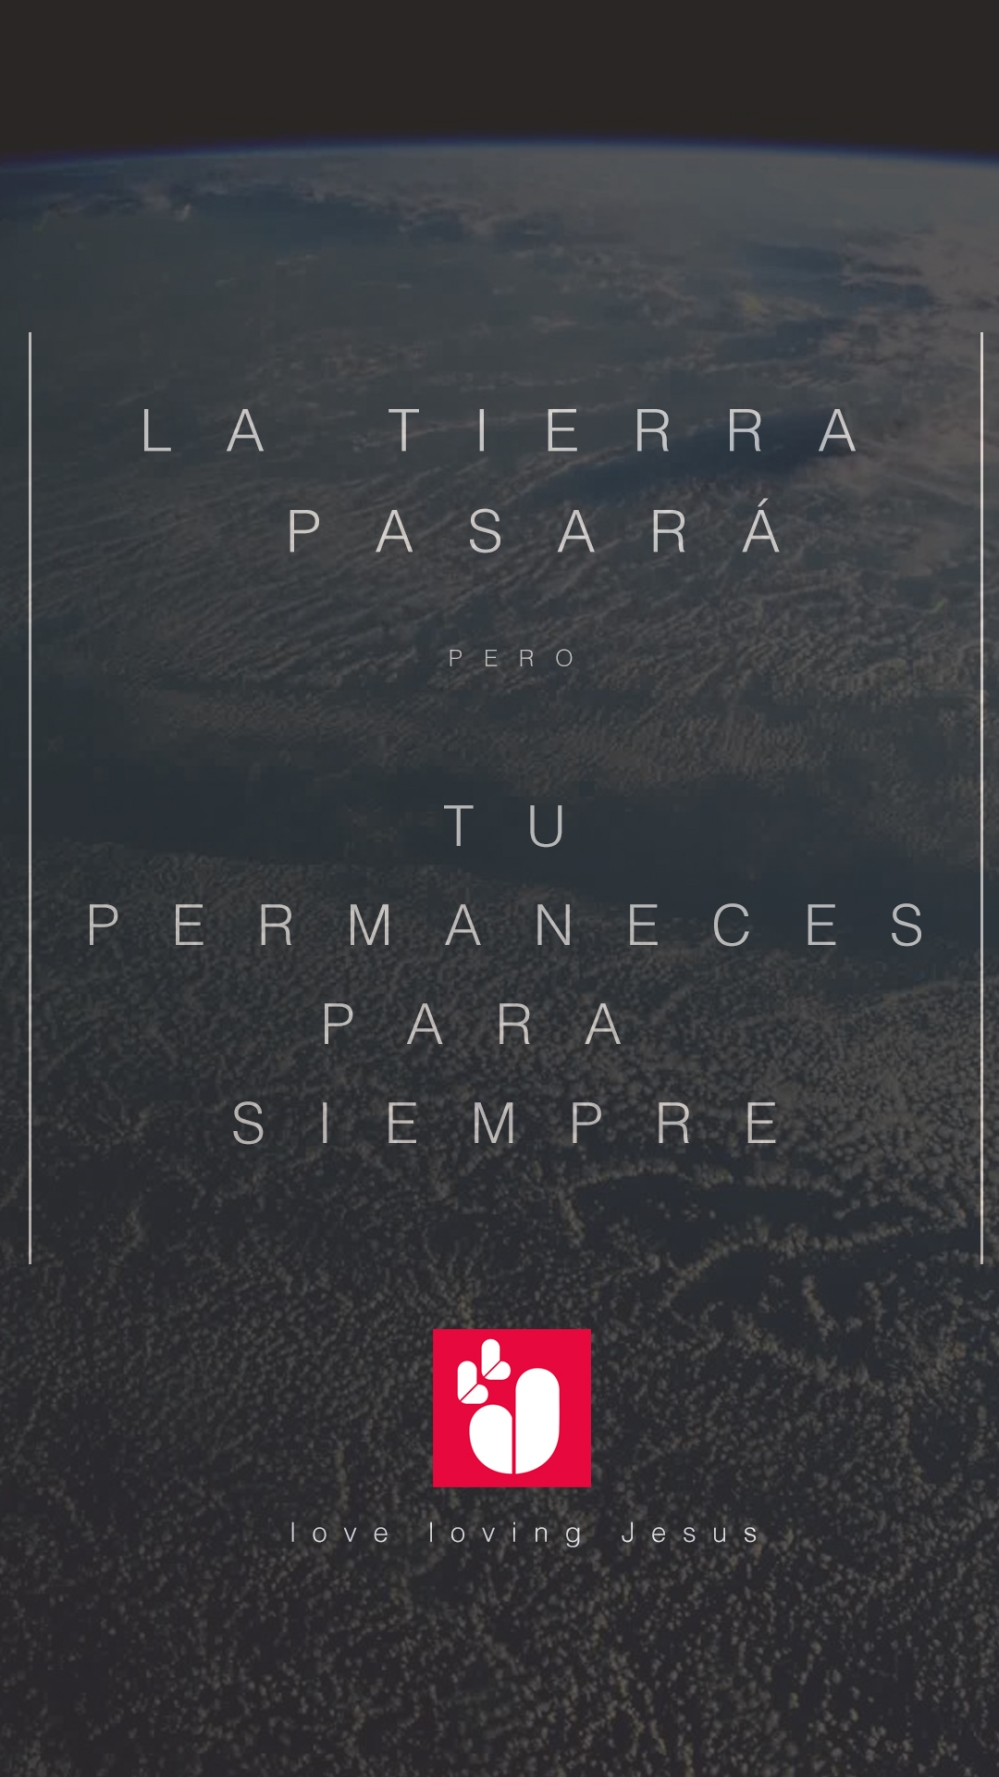 latierraPasaraiPhone